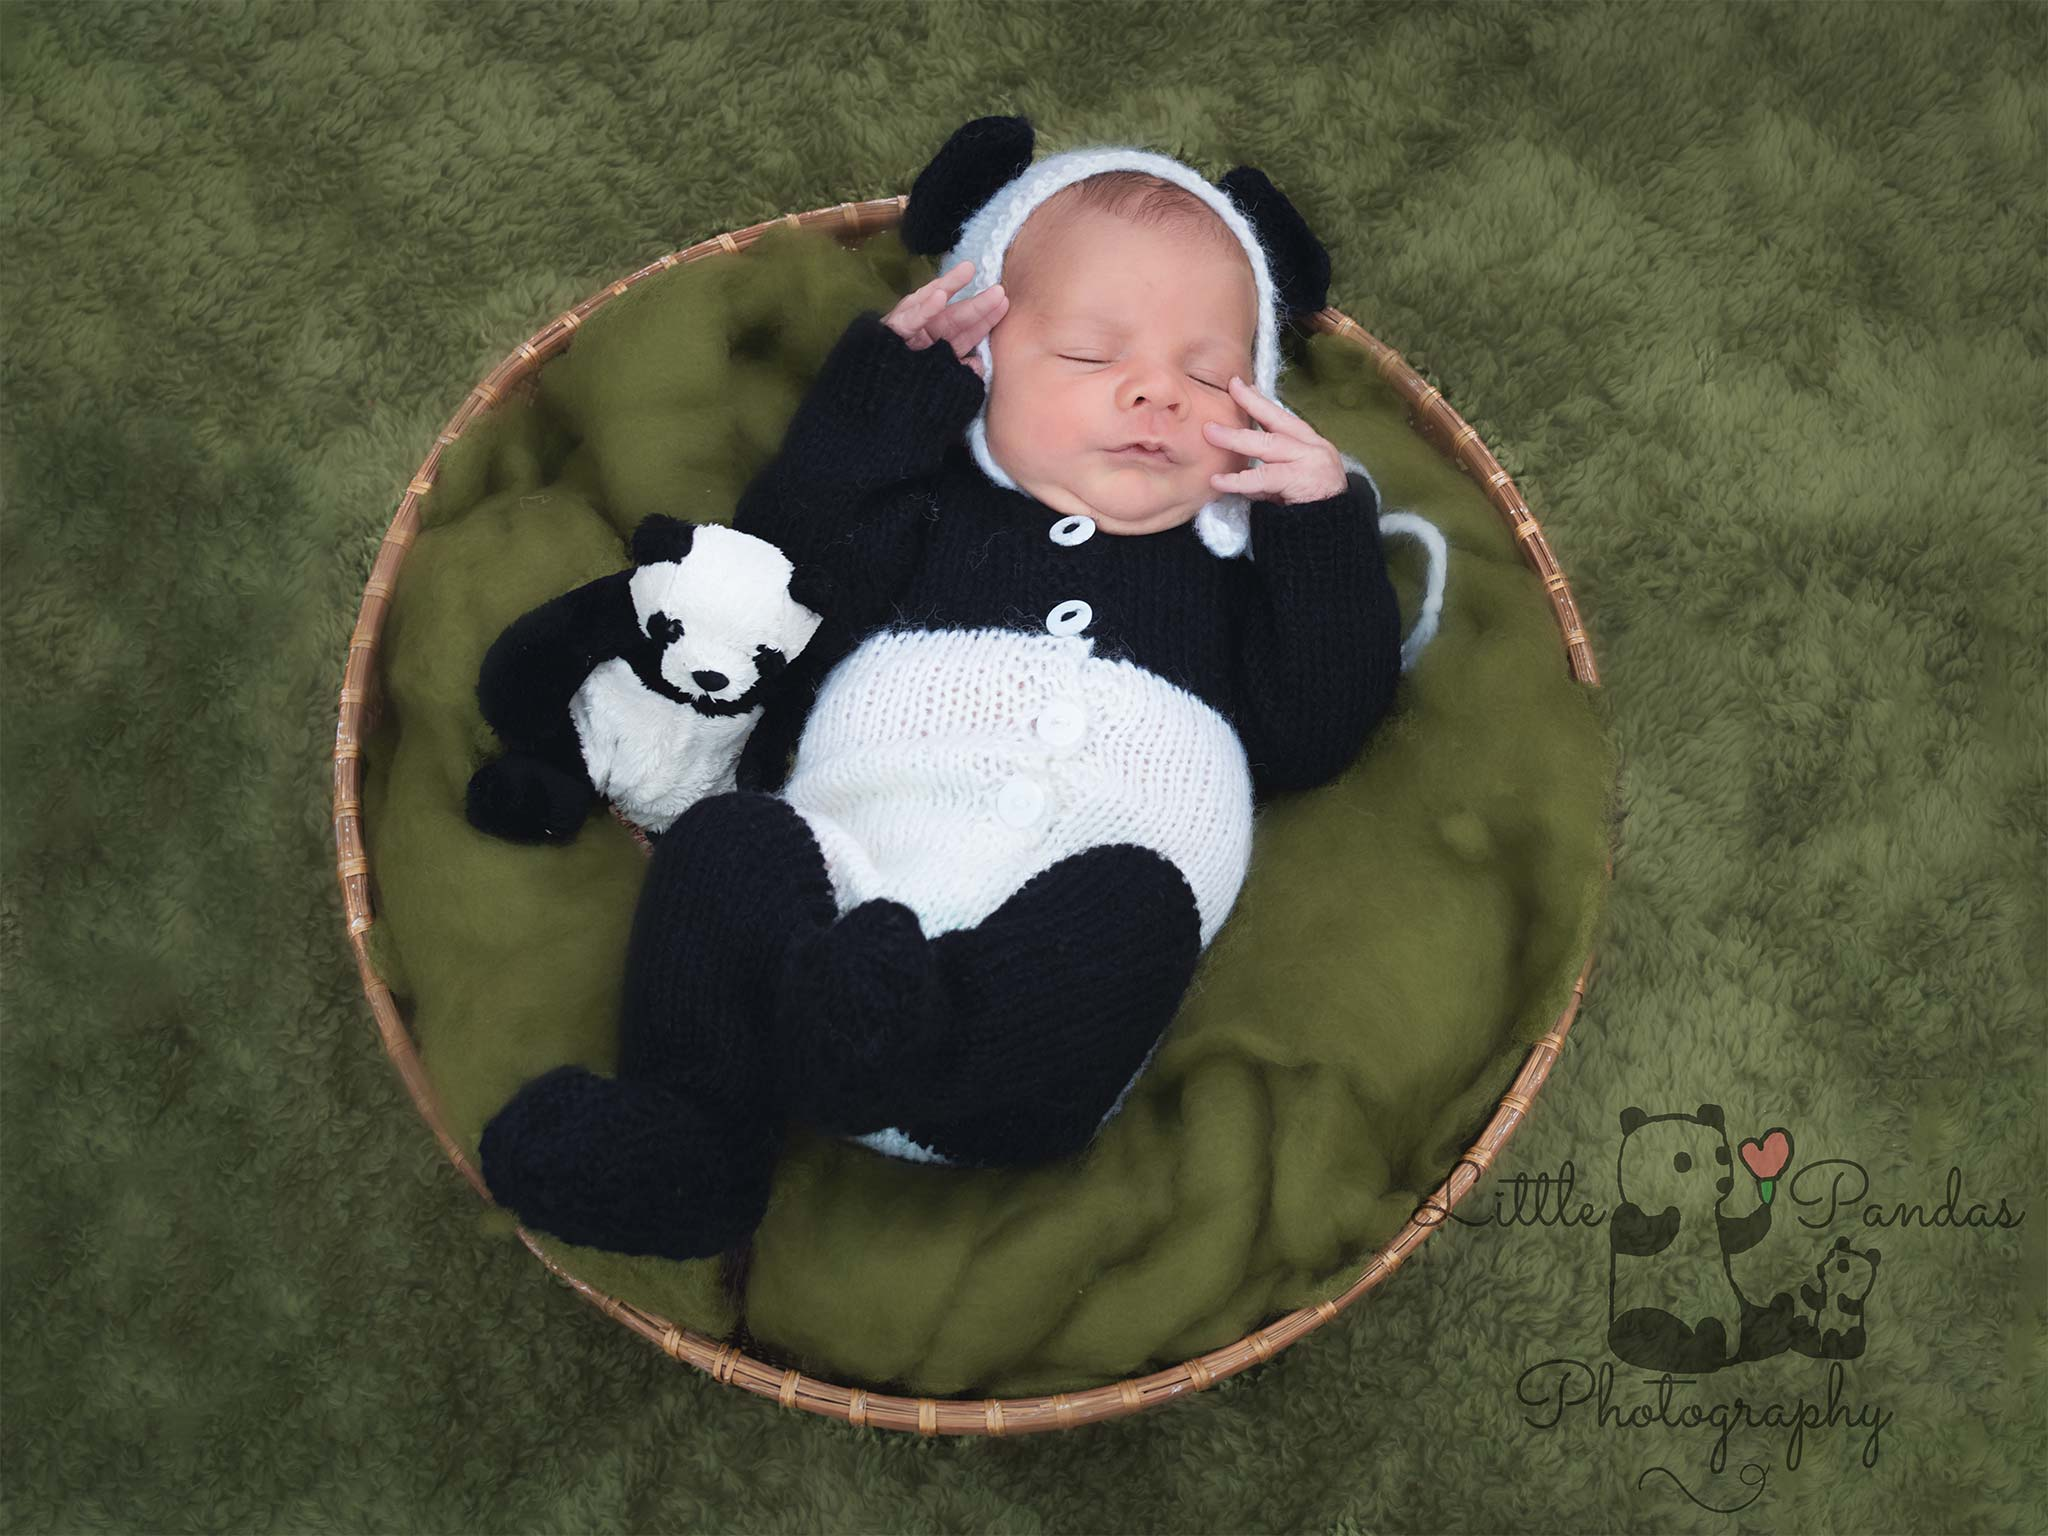 Little Pandas photography socially distanced newborn sessions